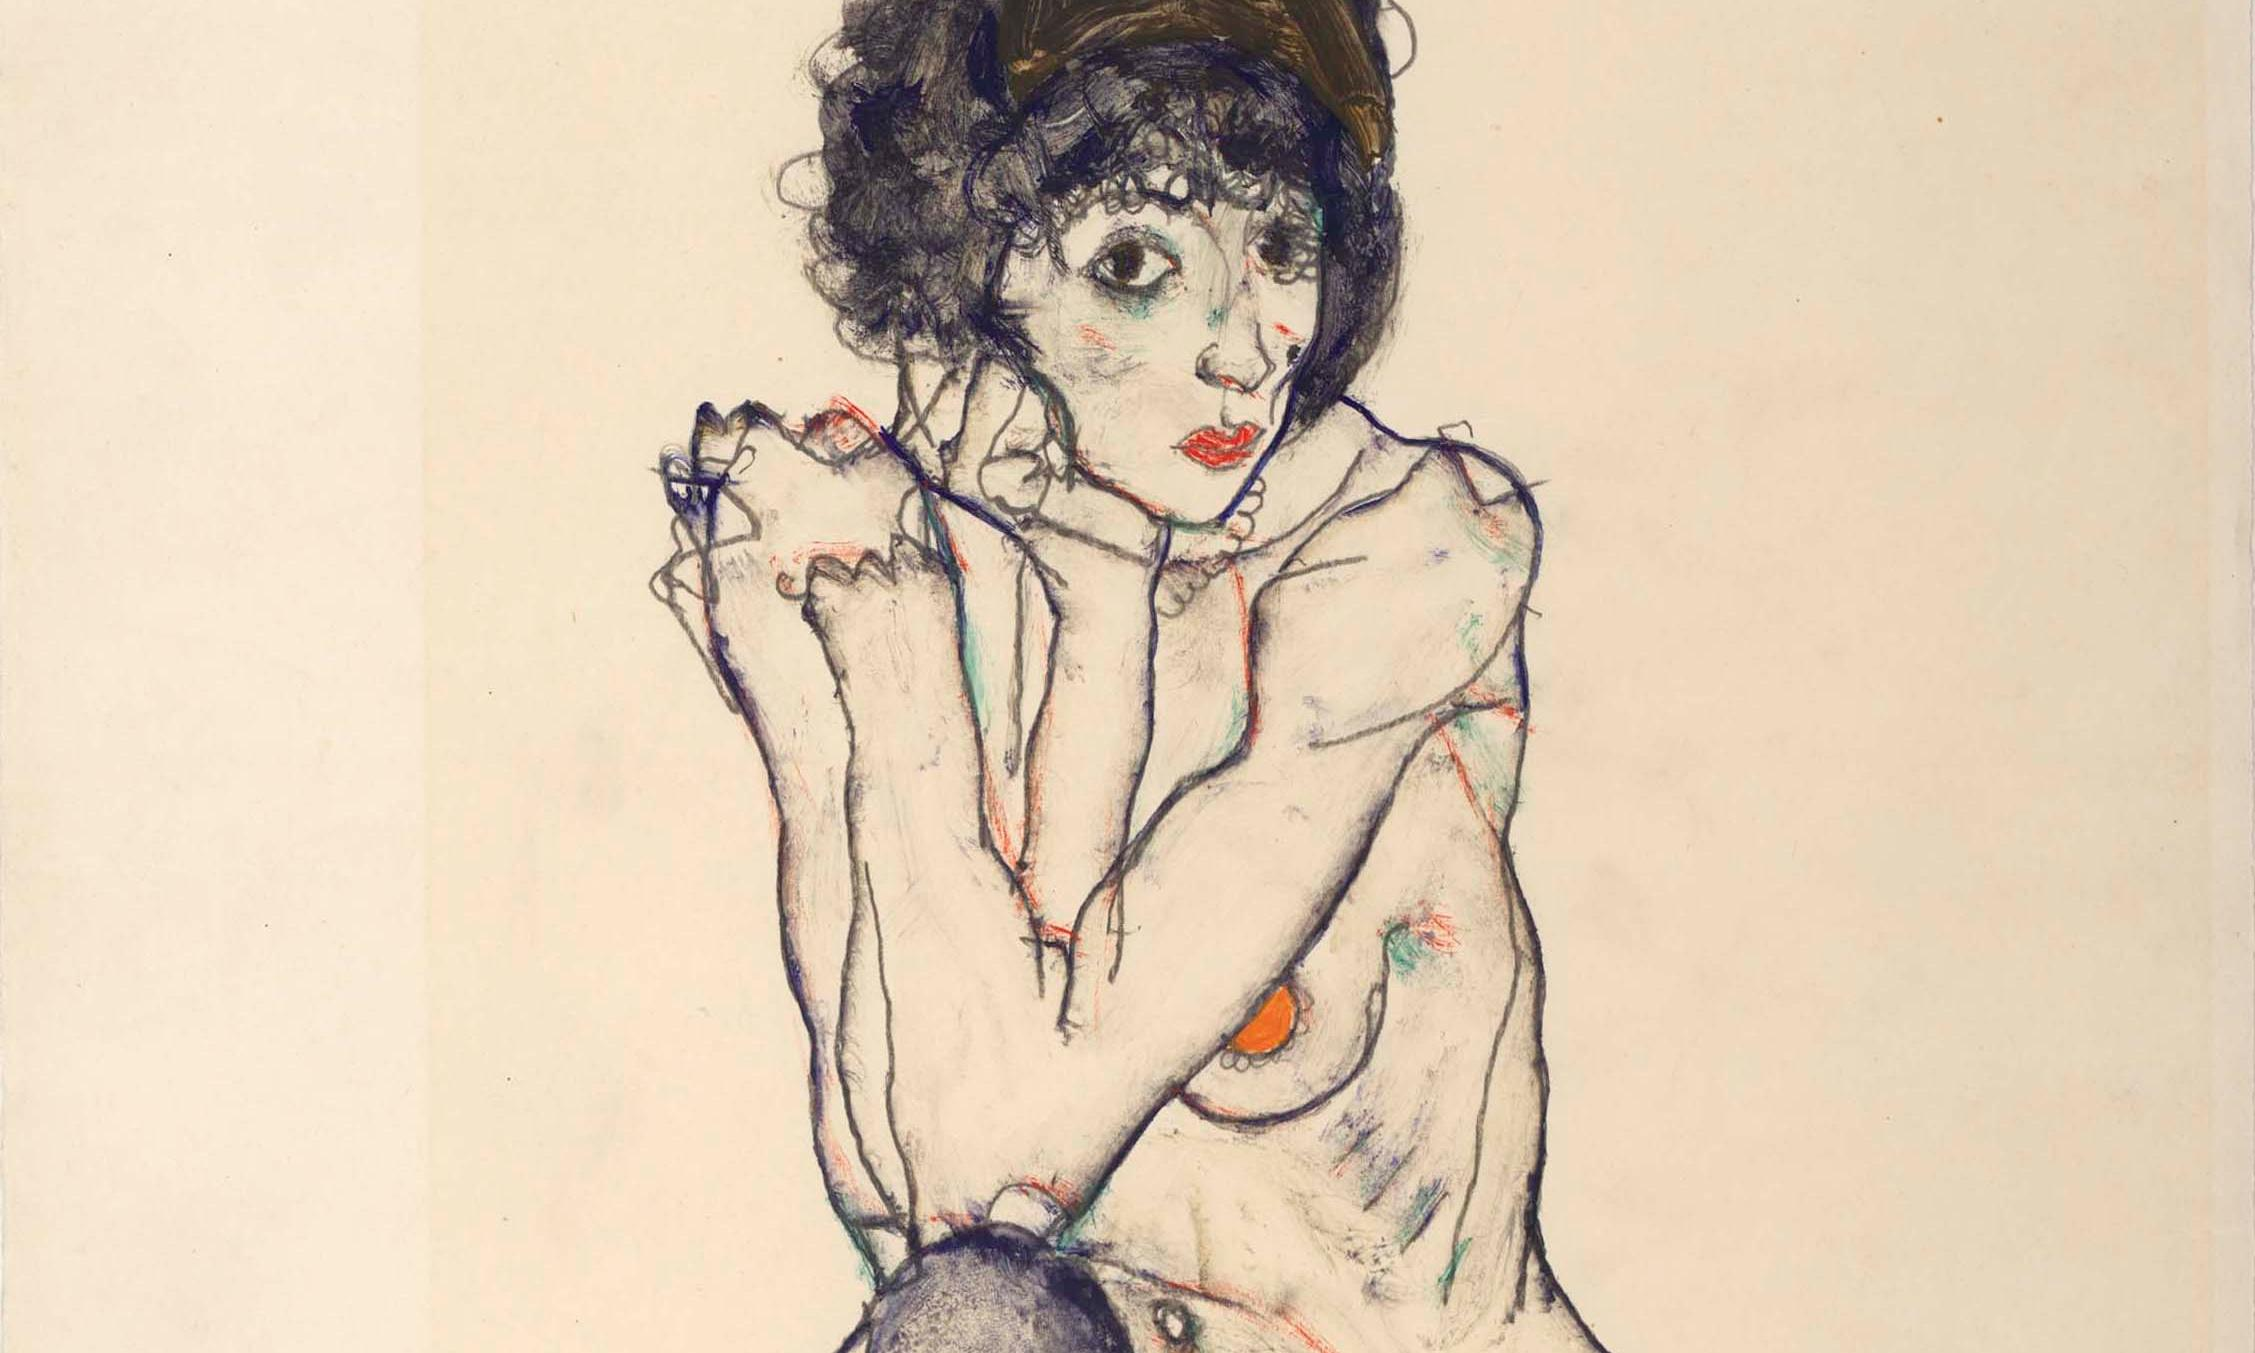 Egon Schiele's Seated Female Nude … skill and sensuality